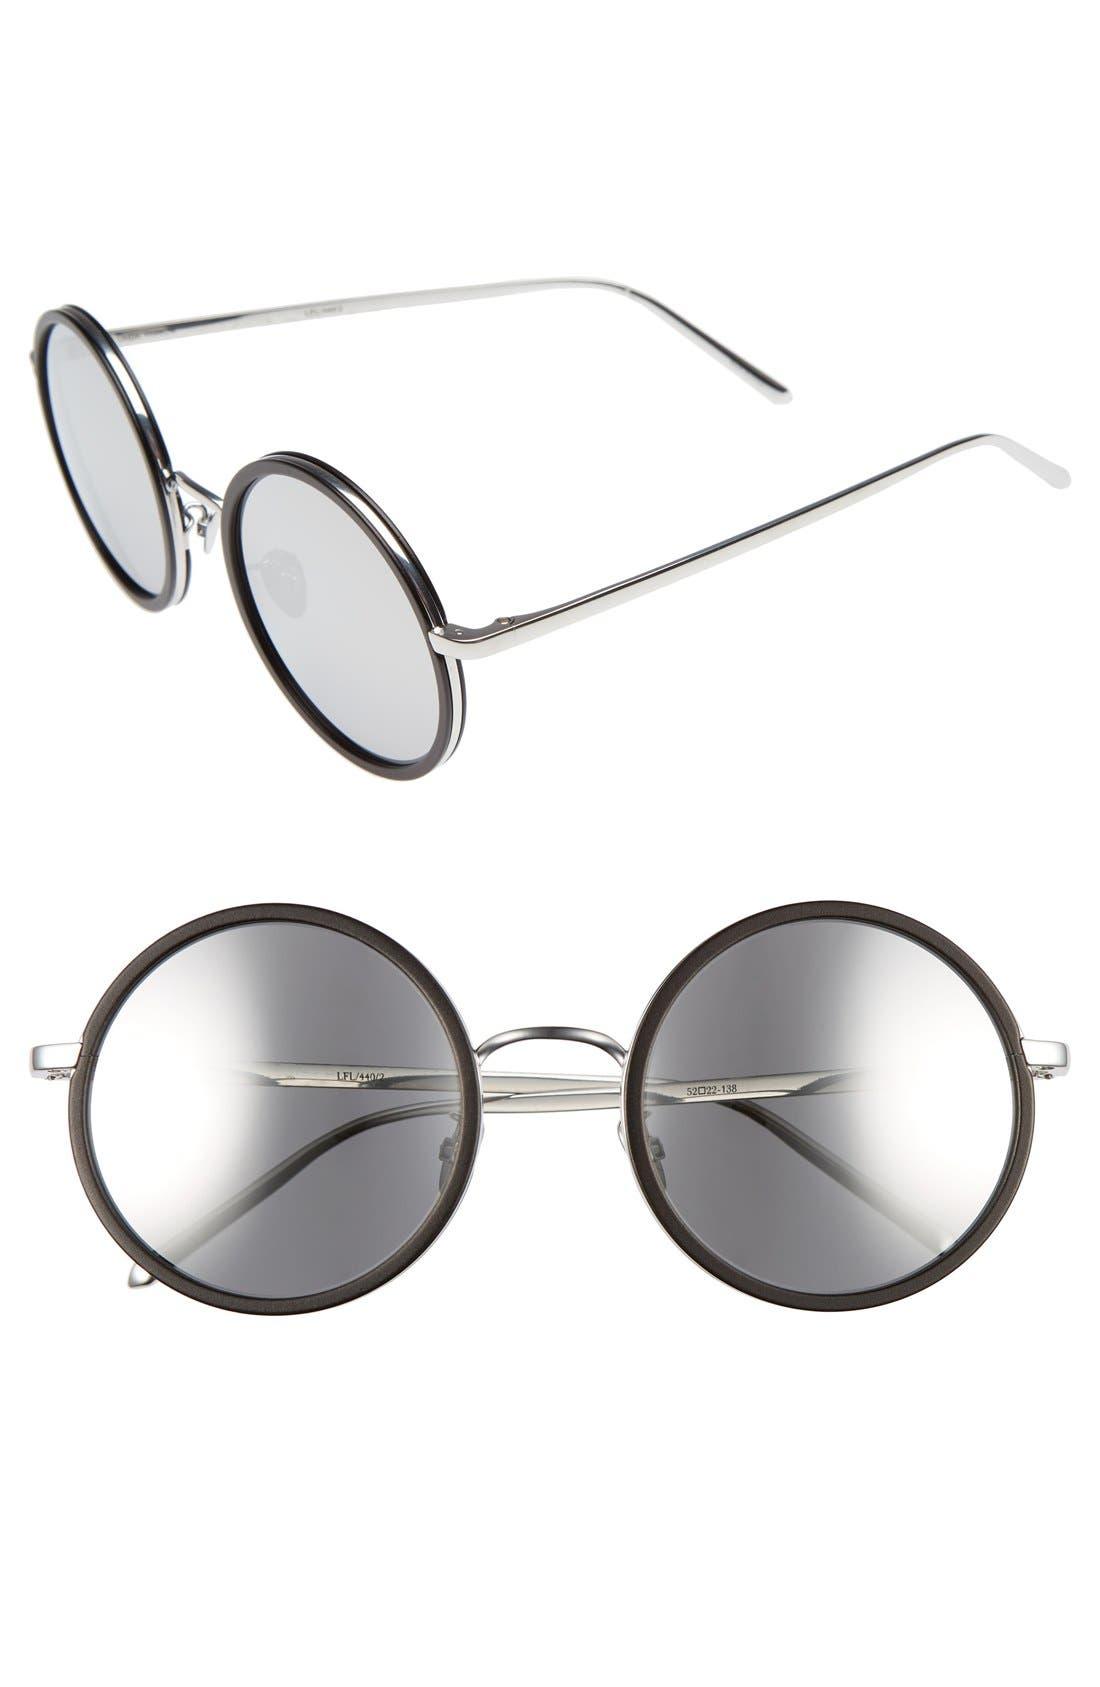 Linda Farrow 52mm Round 18 Karat White Gold Trim Sunglasses